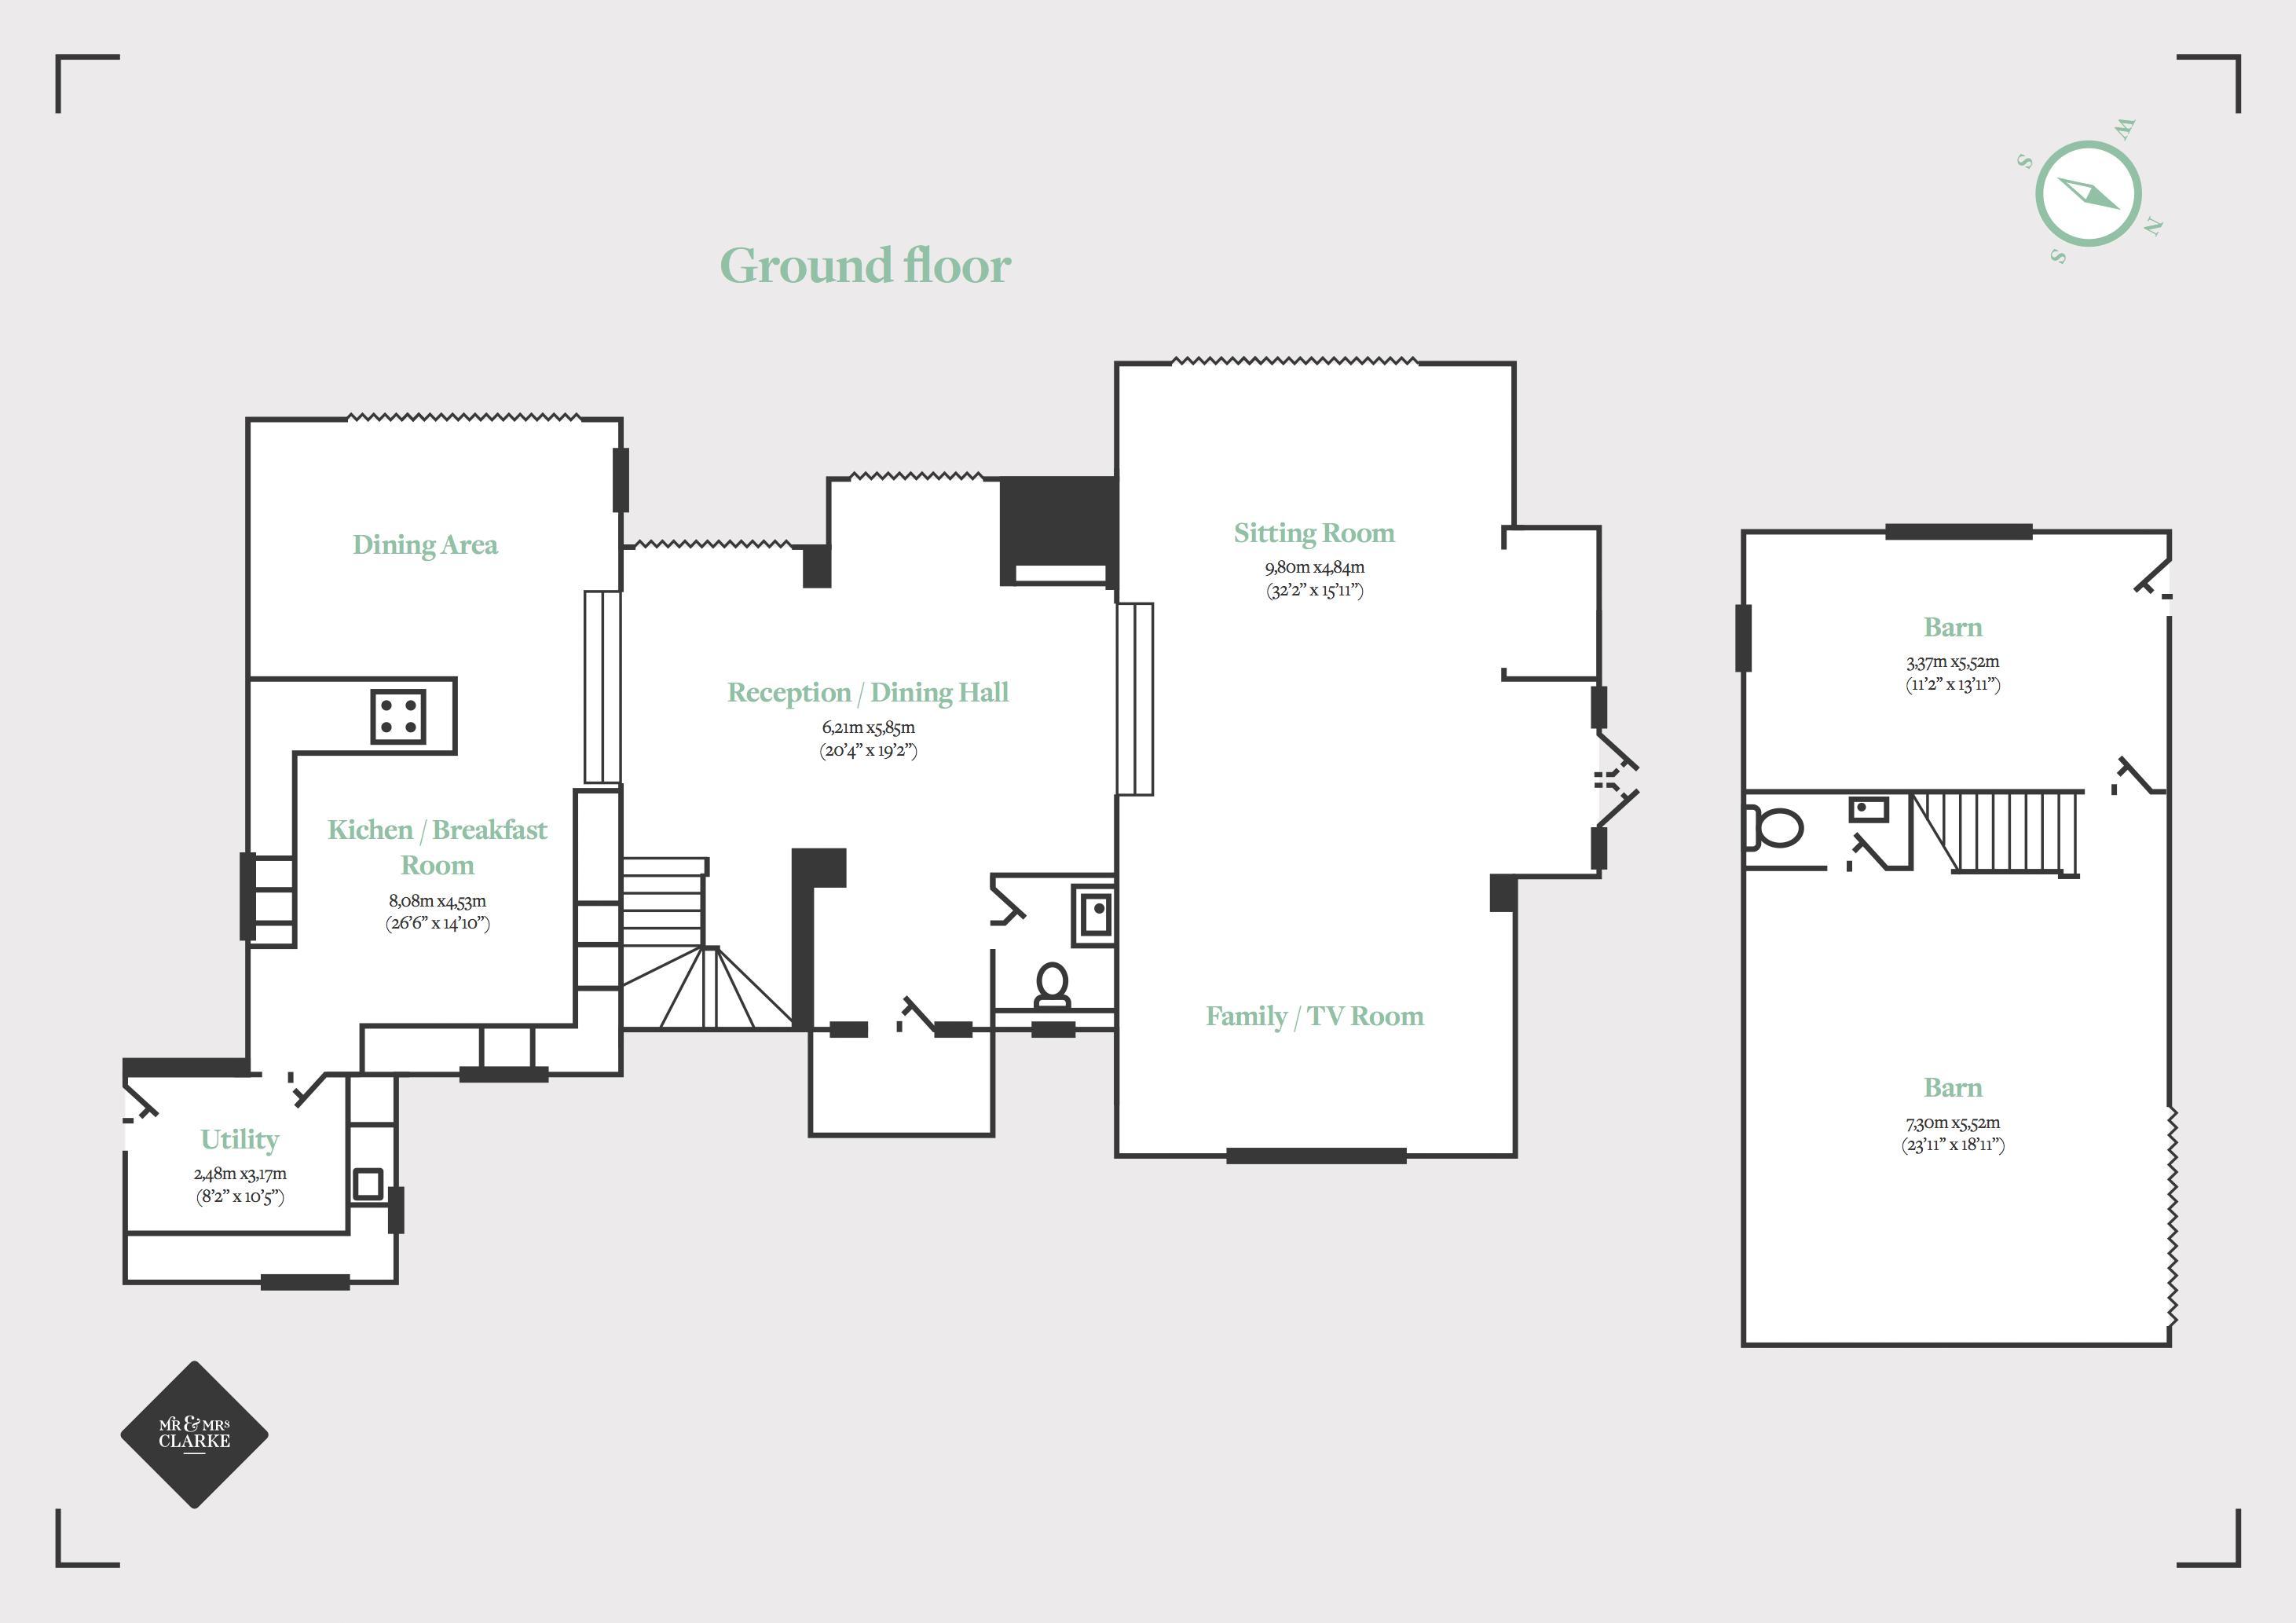 Chestnut House, Lapworth. Floorplan.